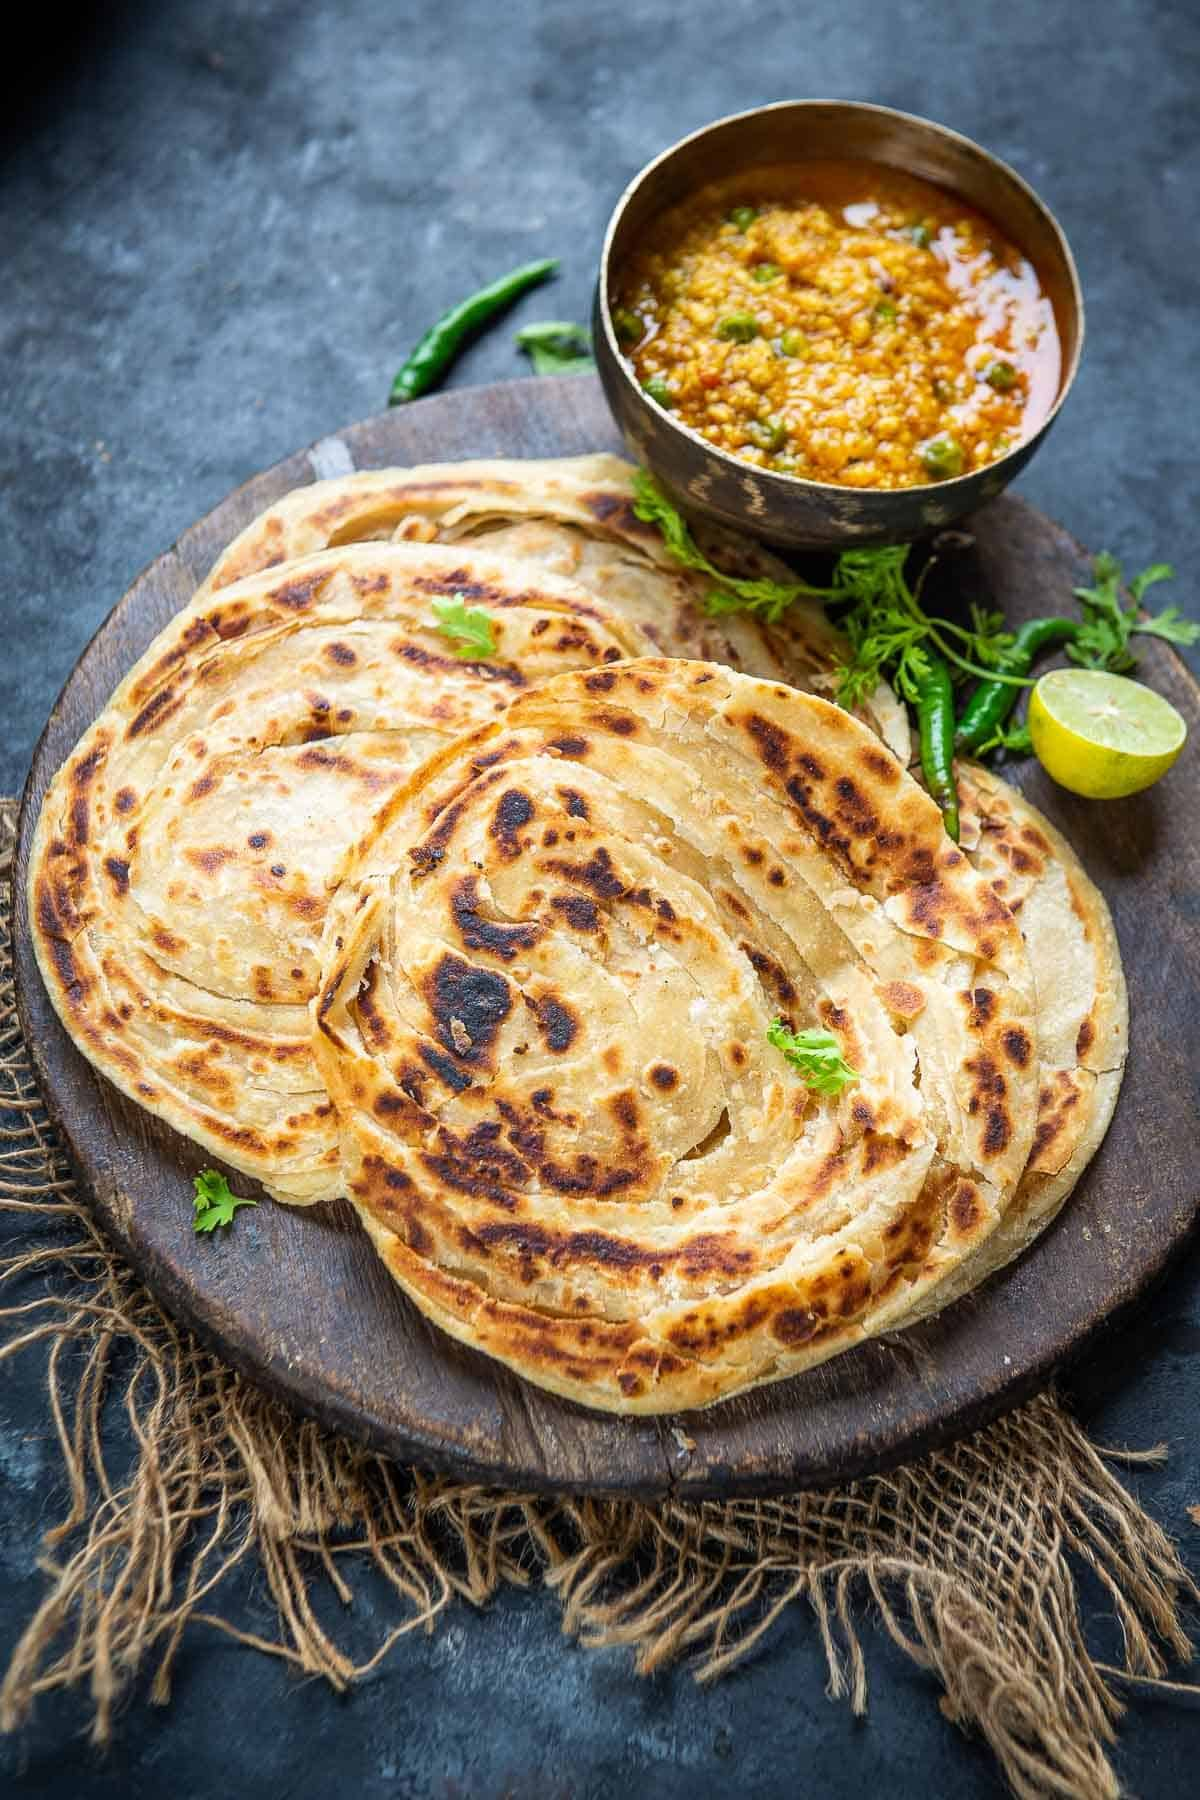 Lachha paratha served on a plate.